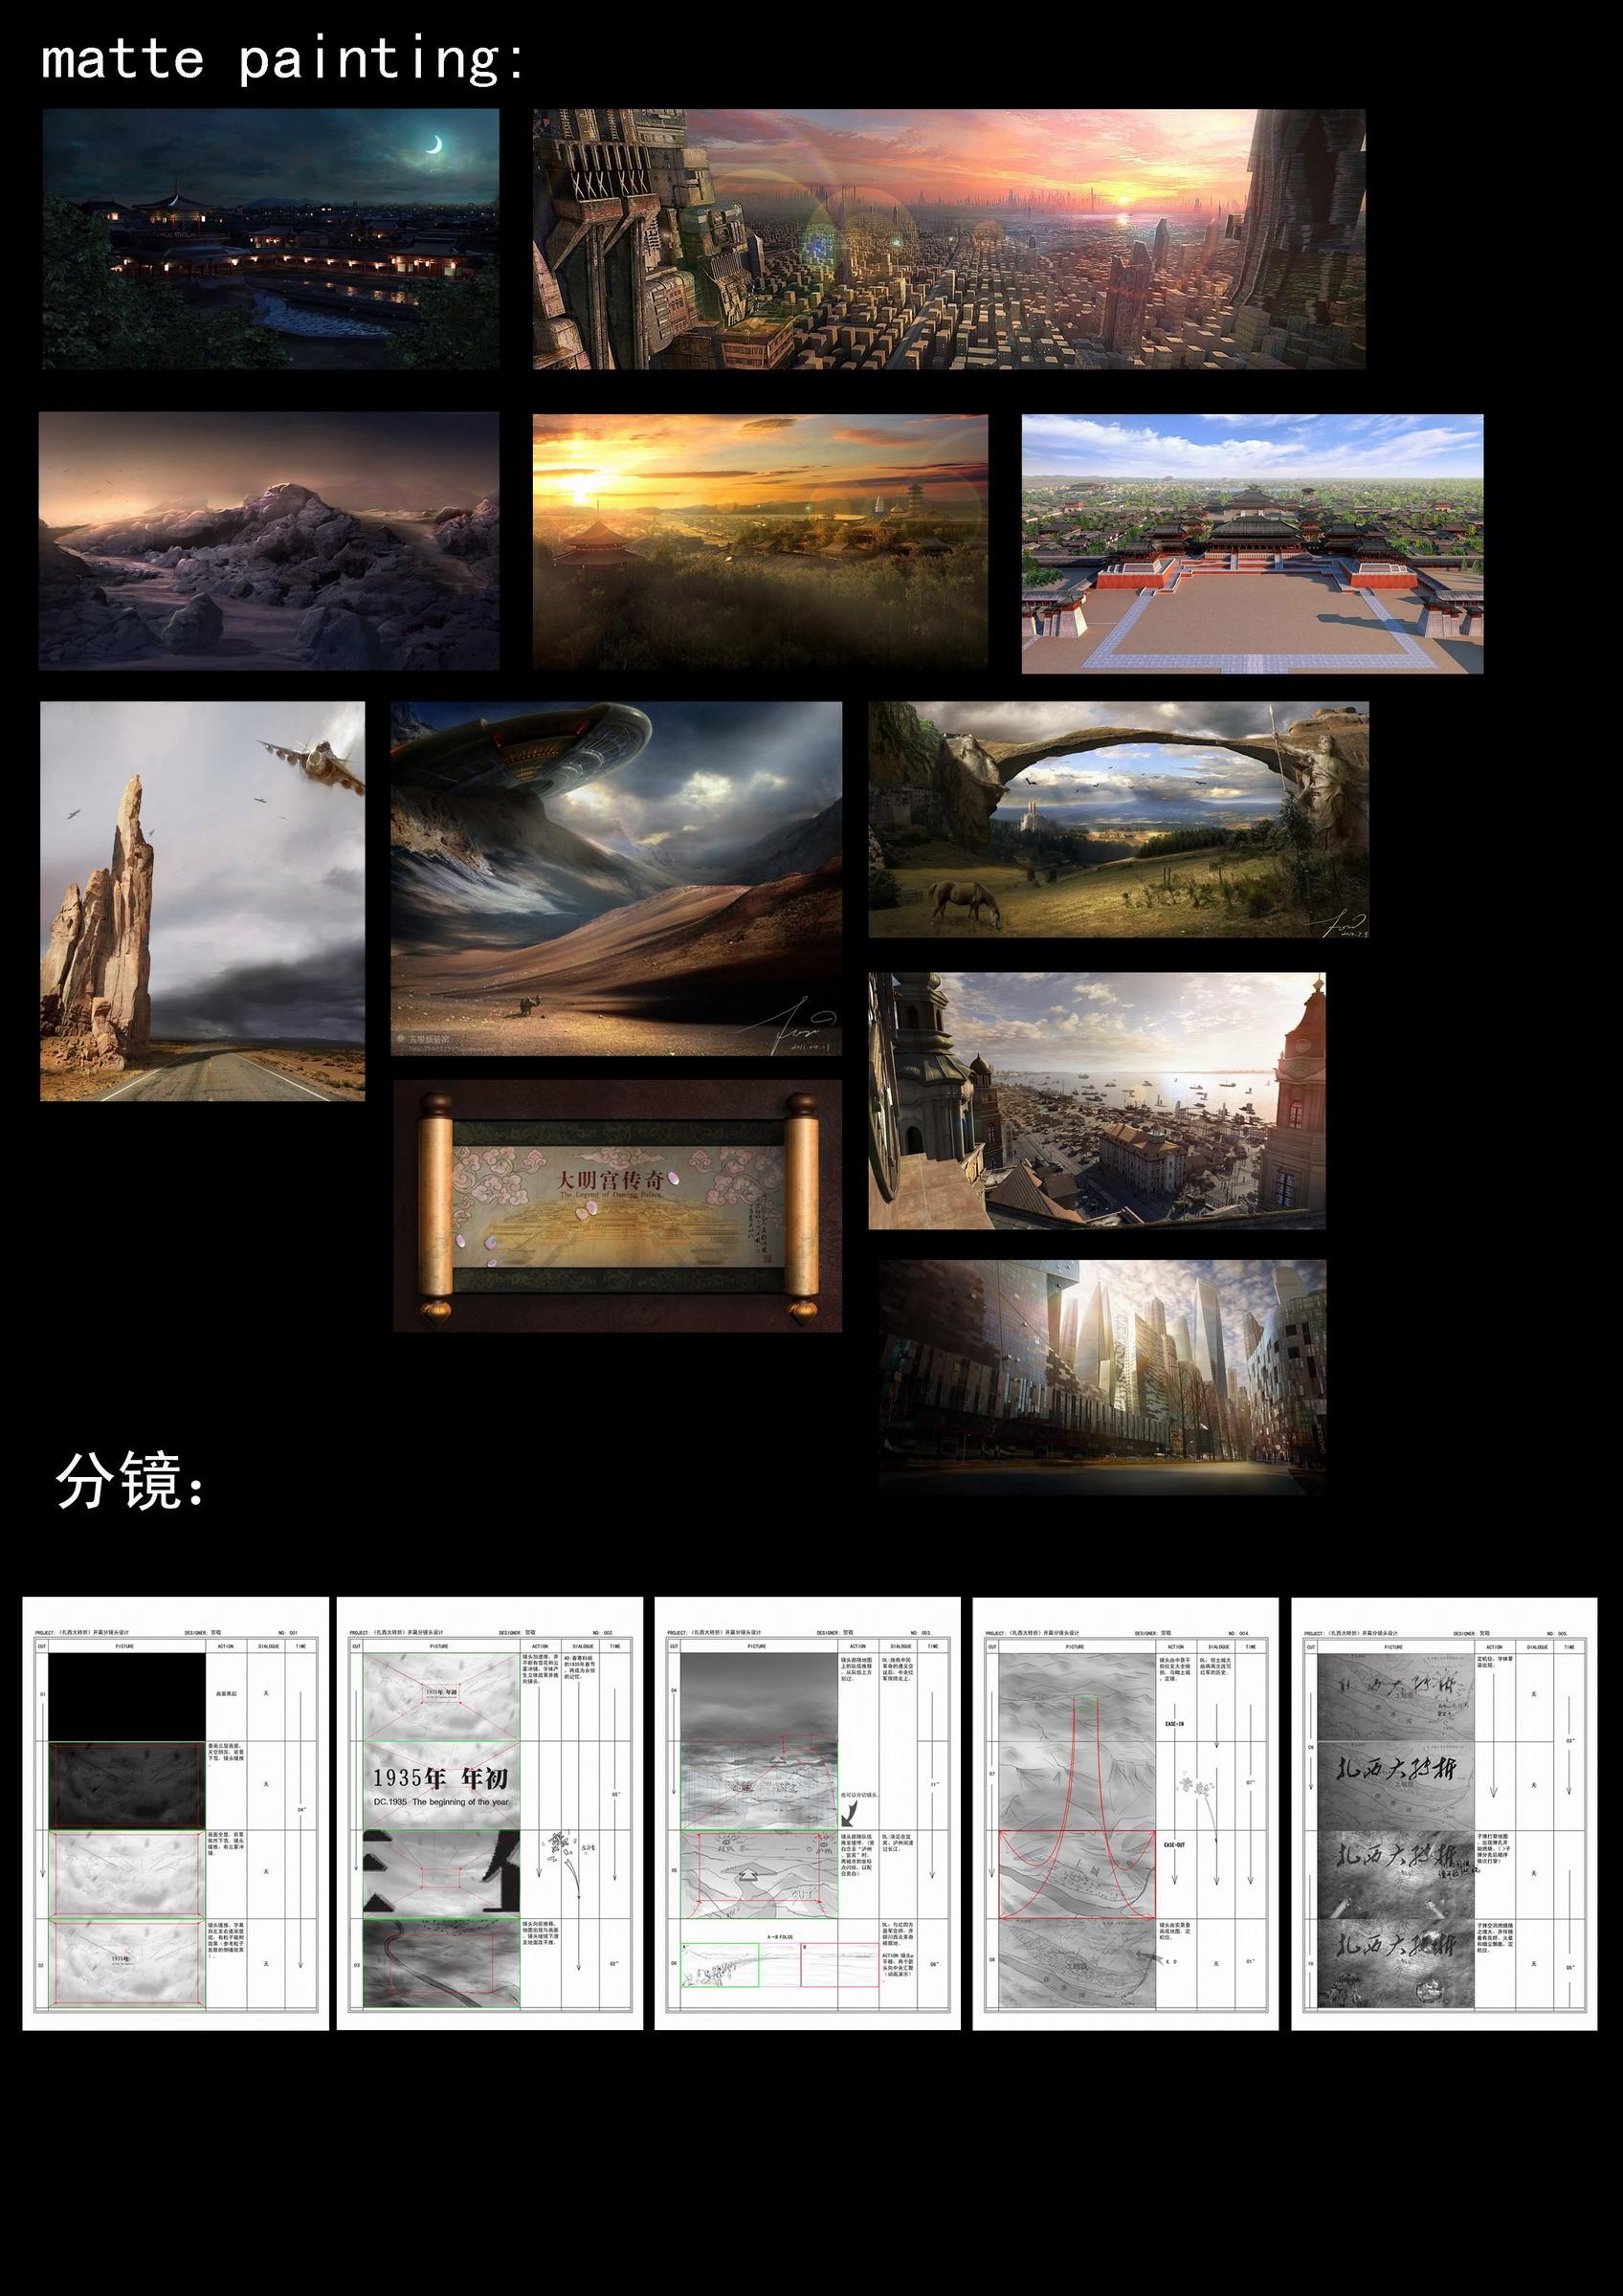 matte painting作品和分镜头设计